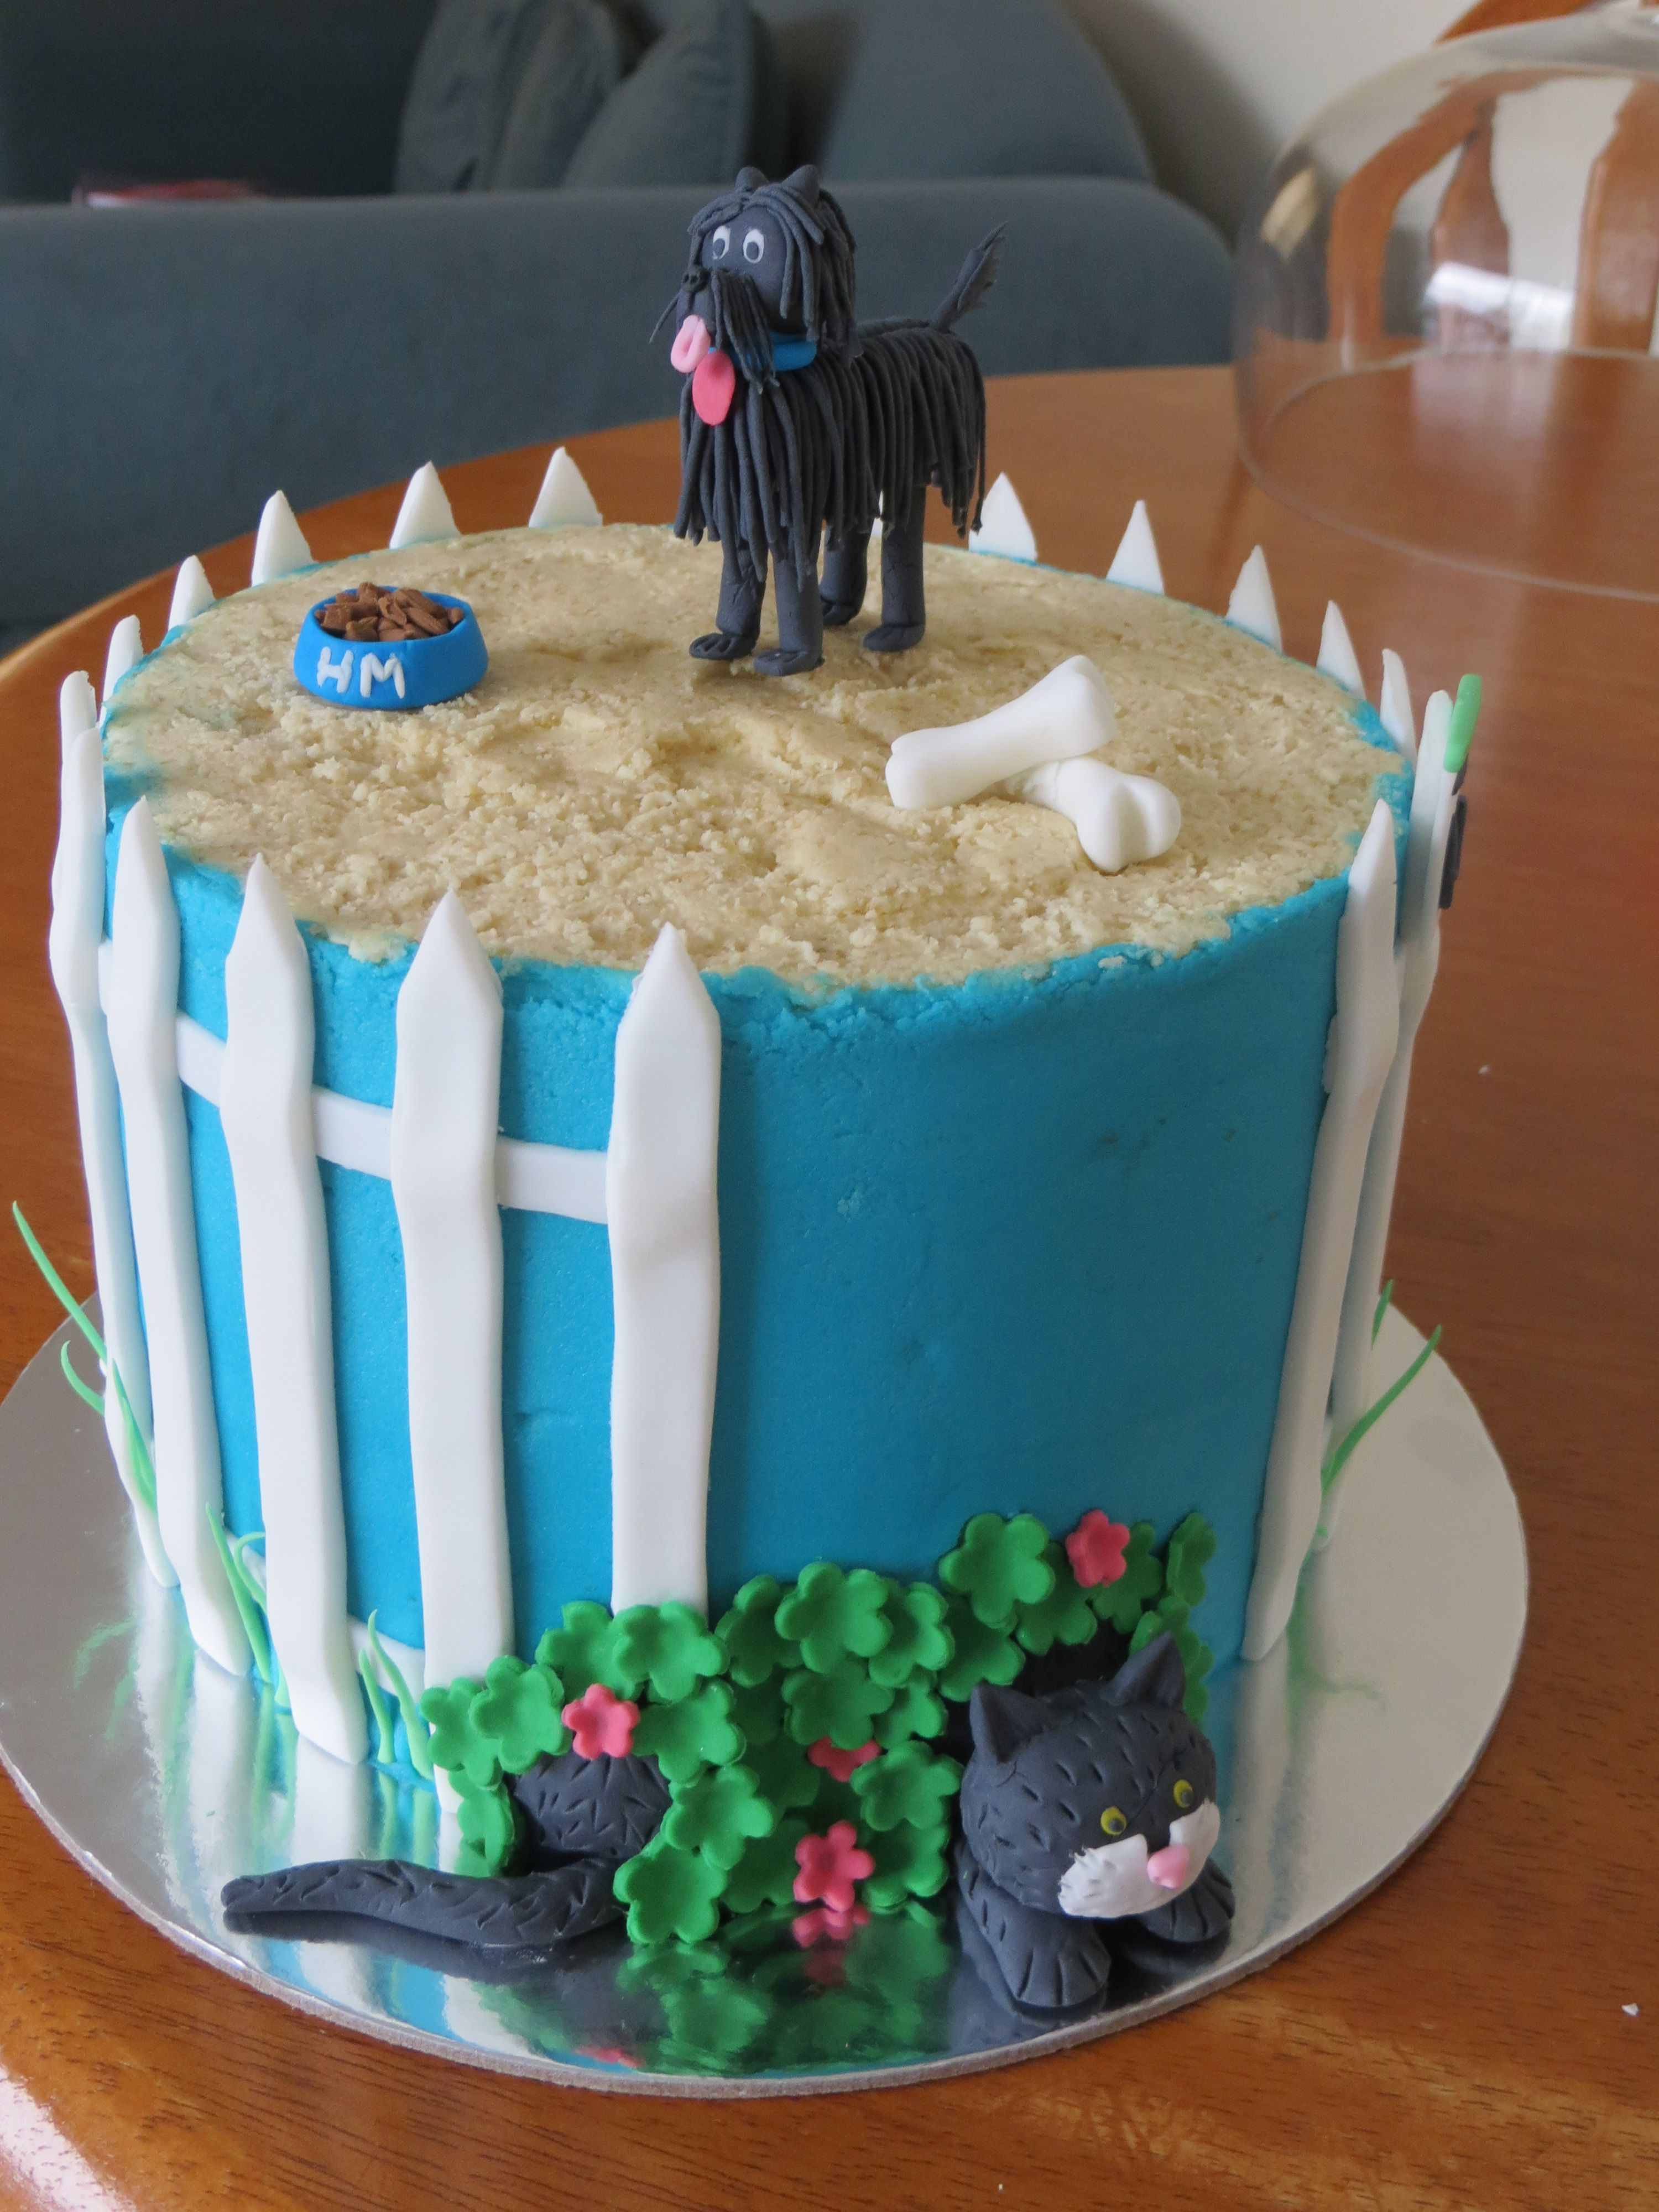 Hairy Maclary Cake For A 1st Birthday Has Hairy Maclary And